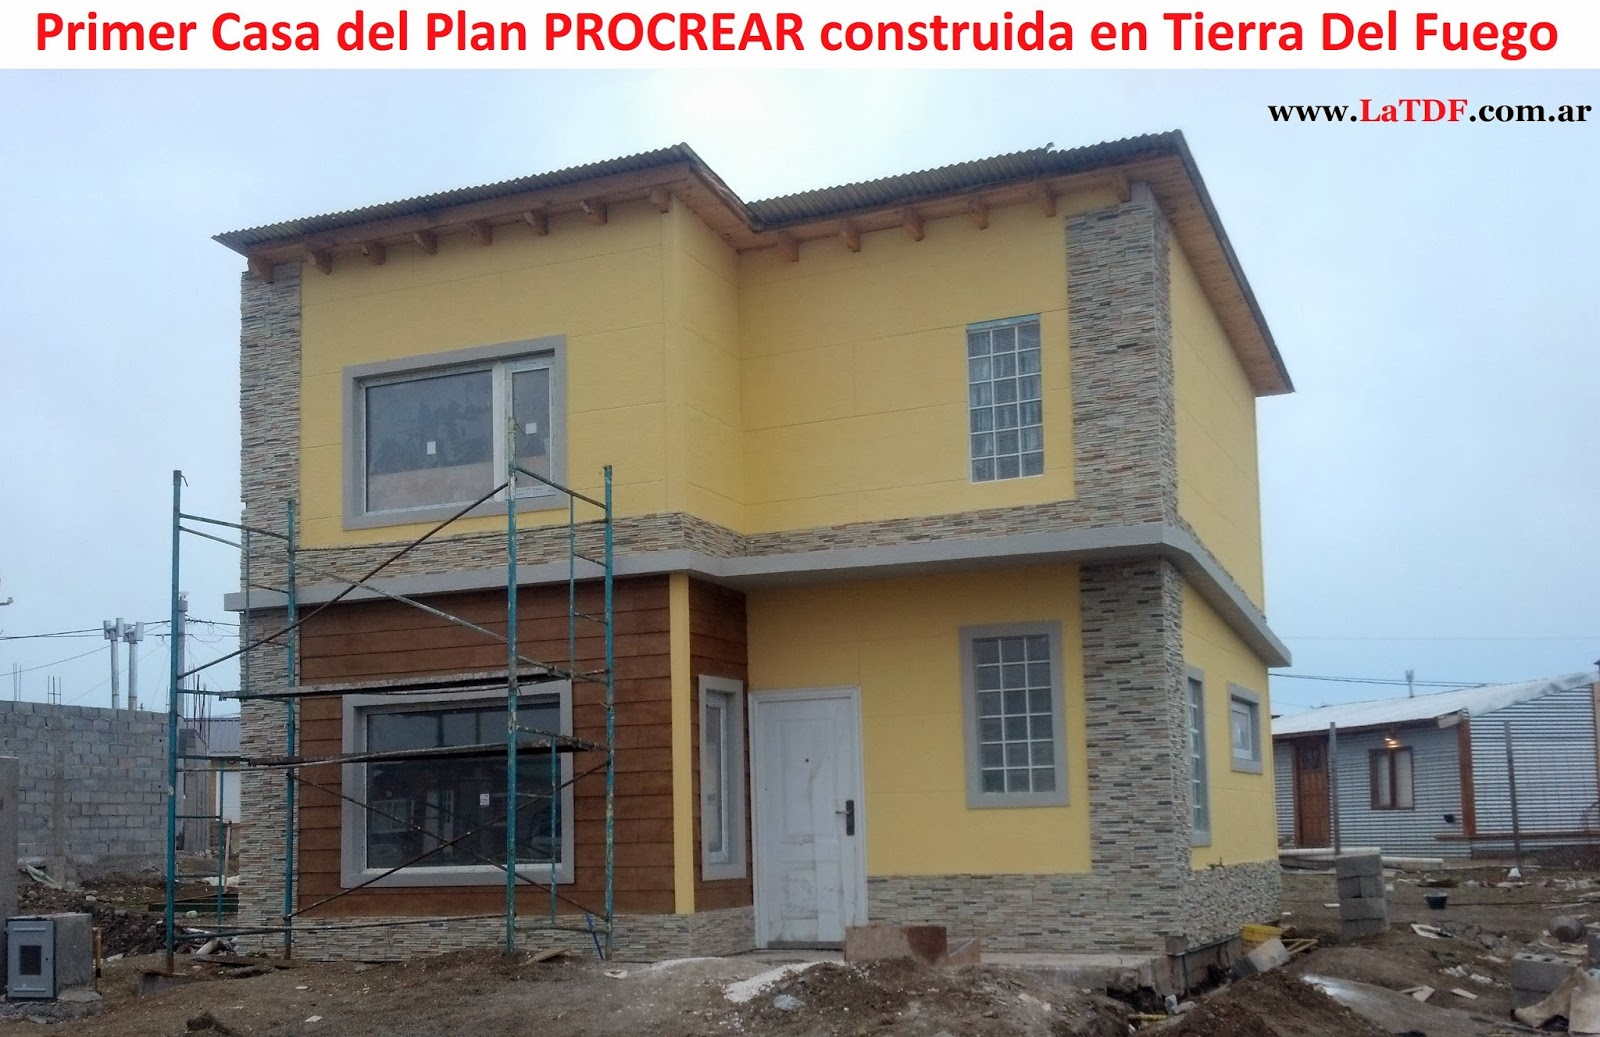 Procrear mart n p rez destac la adjudicaci n de la obra for Modelos casas procrear 2016